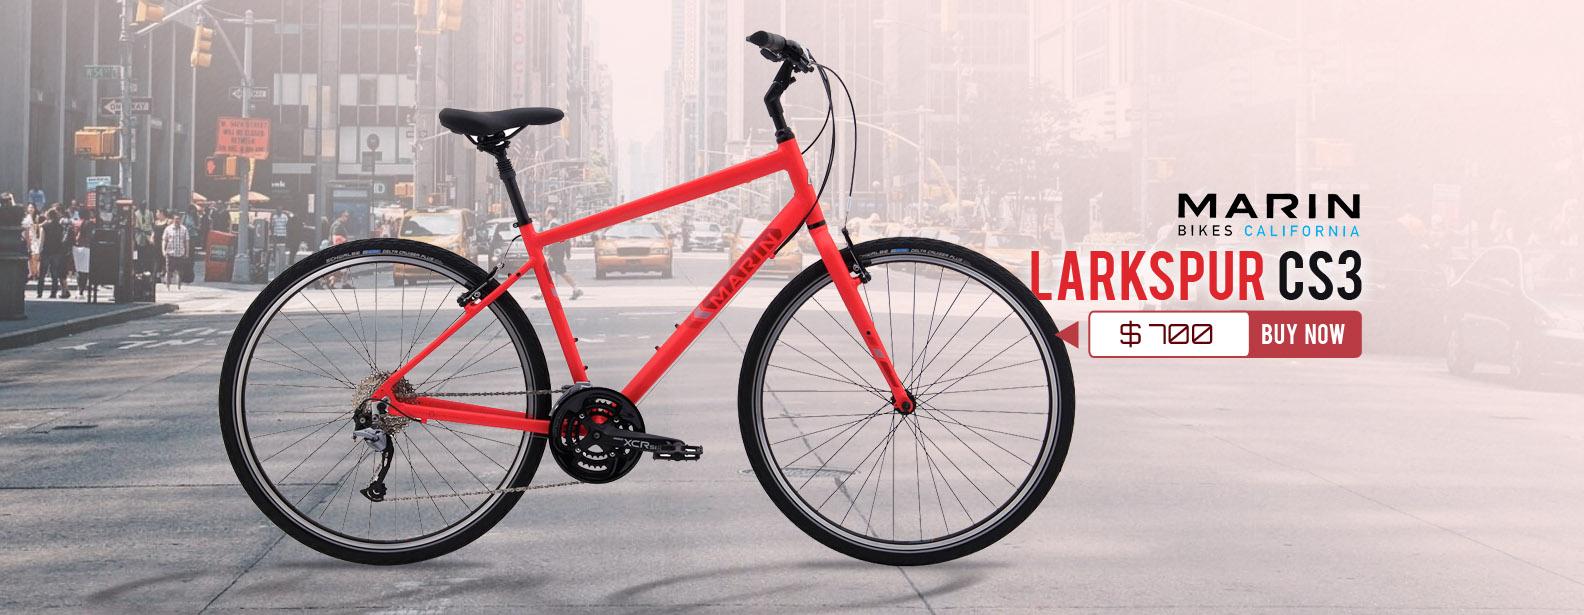 Marin Larkspur CS3 Bike